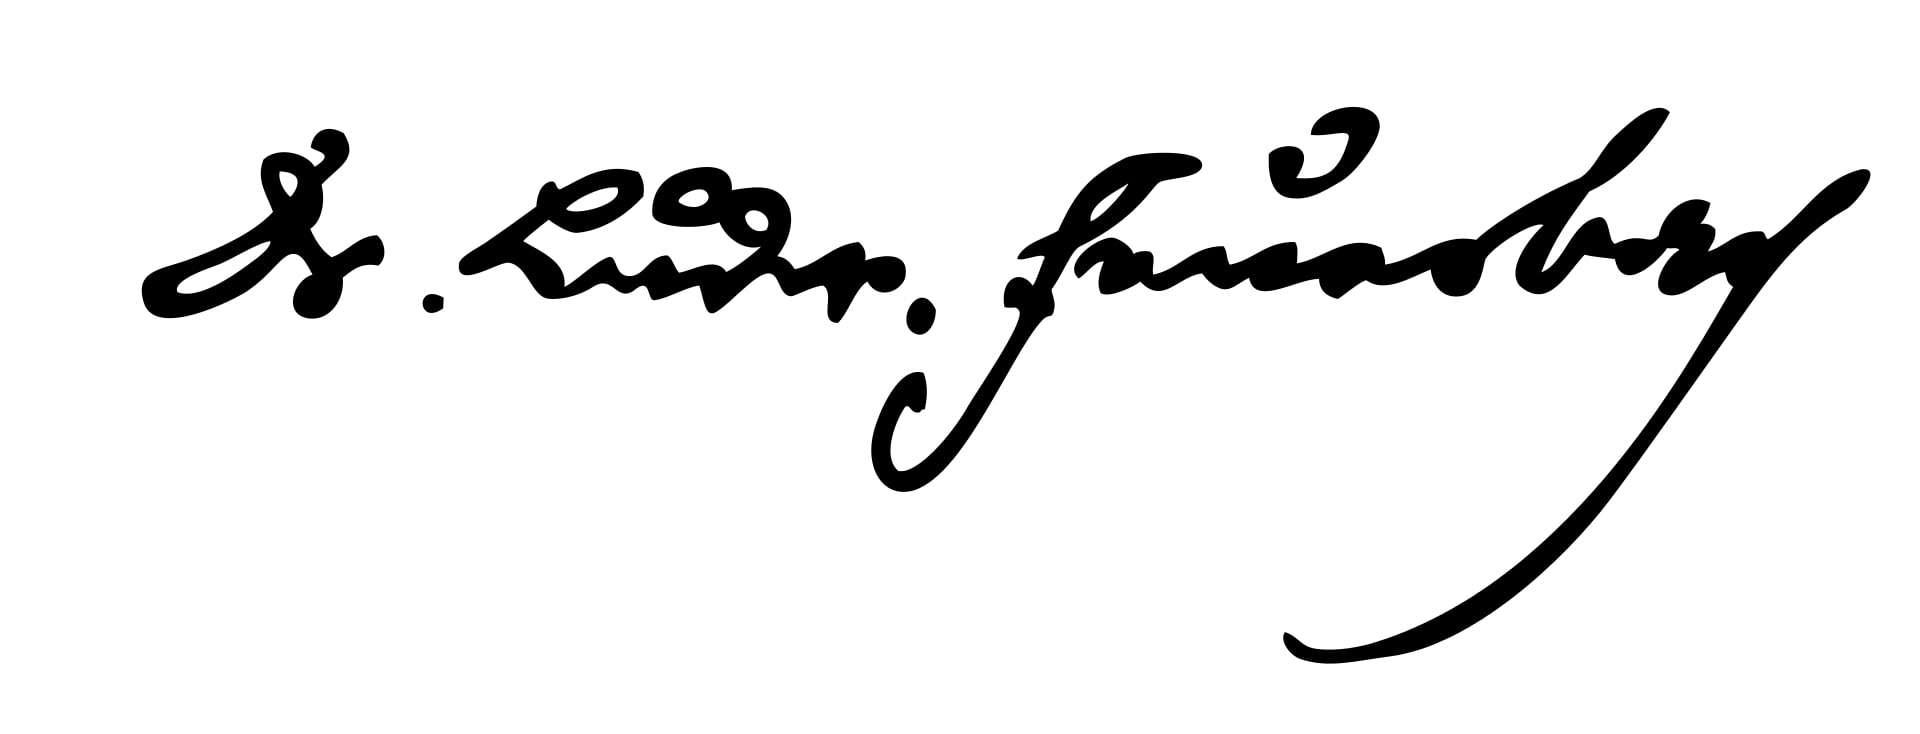 Ludwig Feuerbach Signature